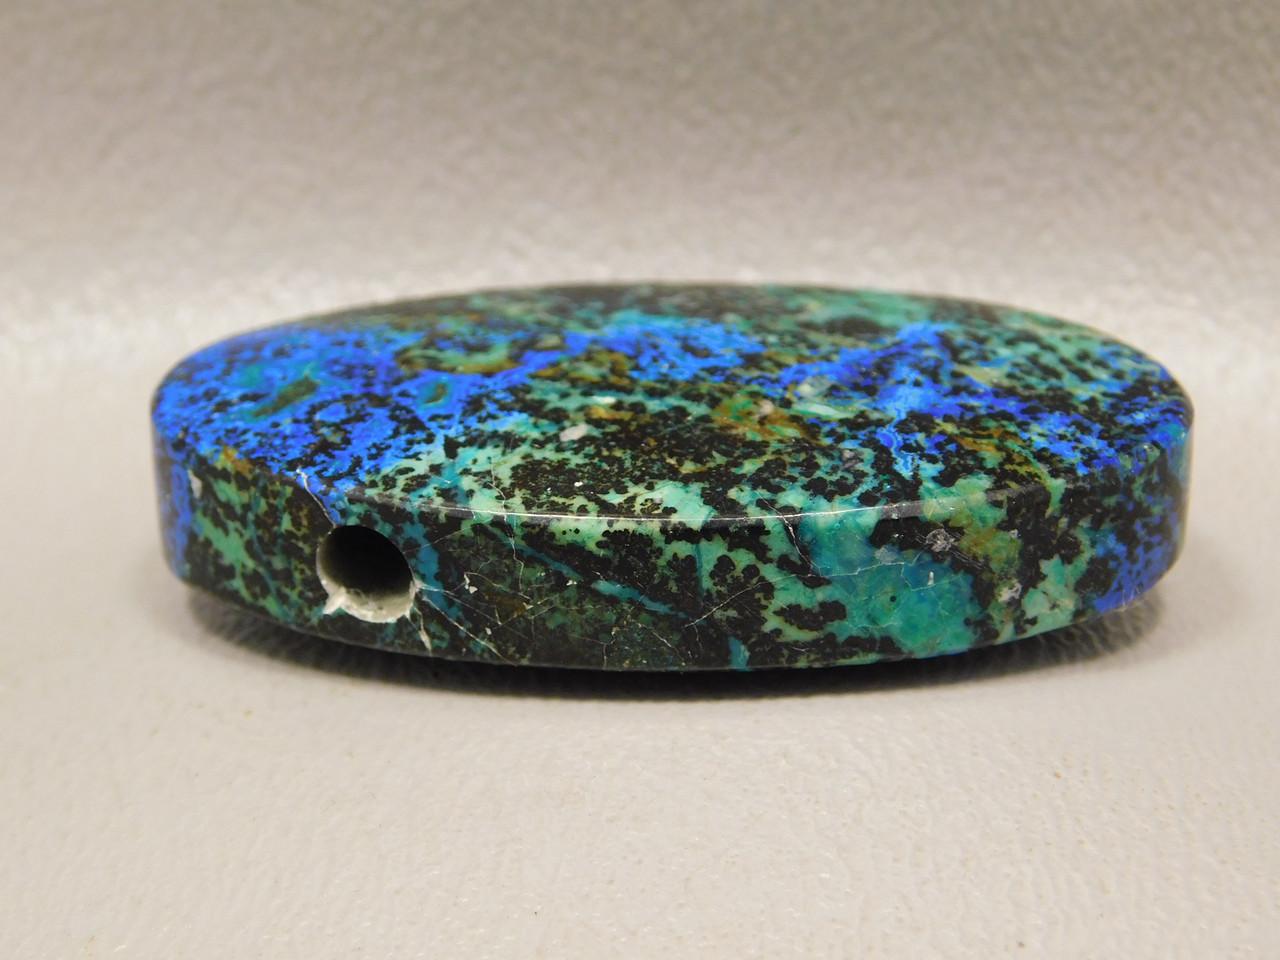 Azurite Malachite Top Drilled Stone Oval Gemstone Bead Pendant #2